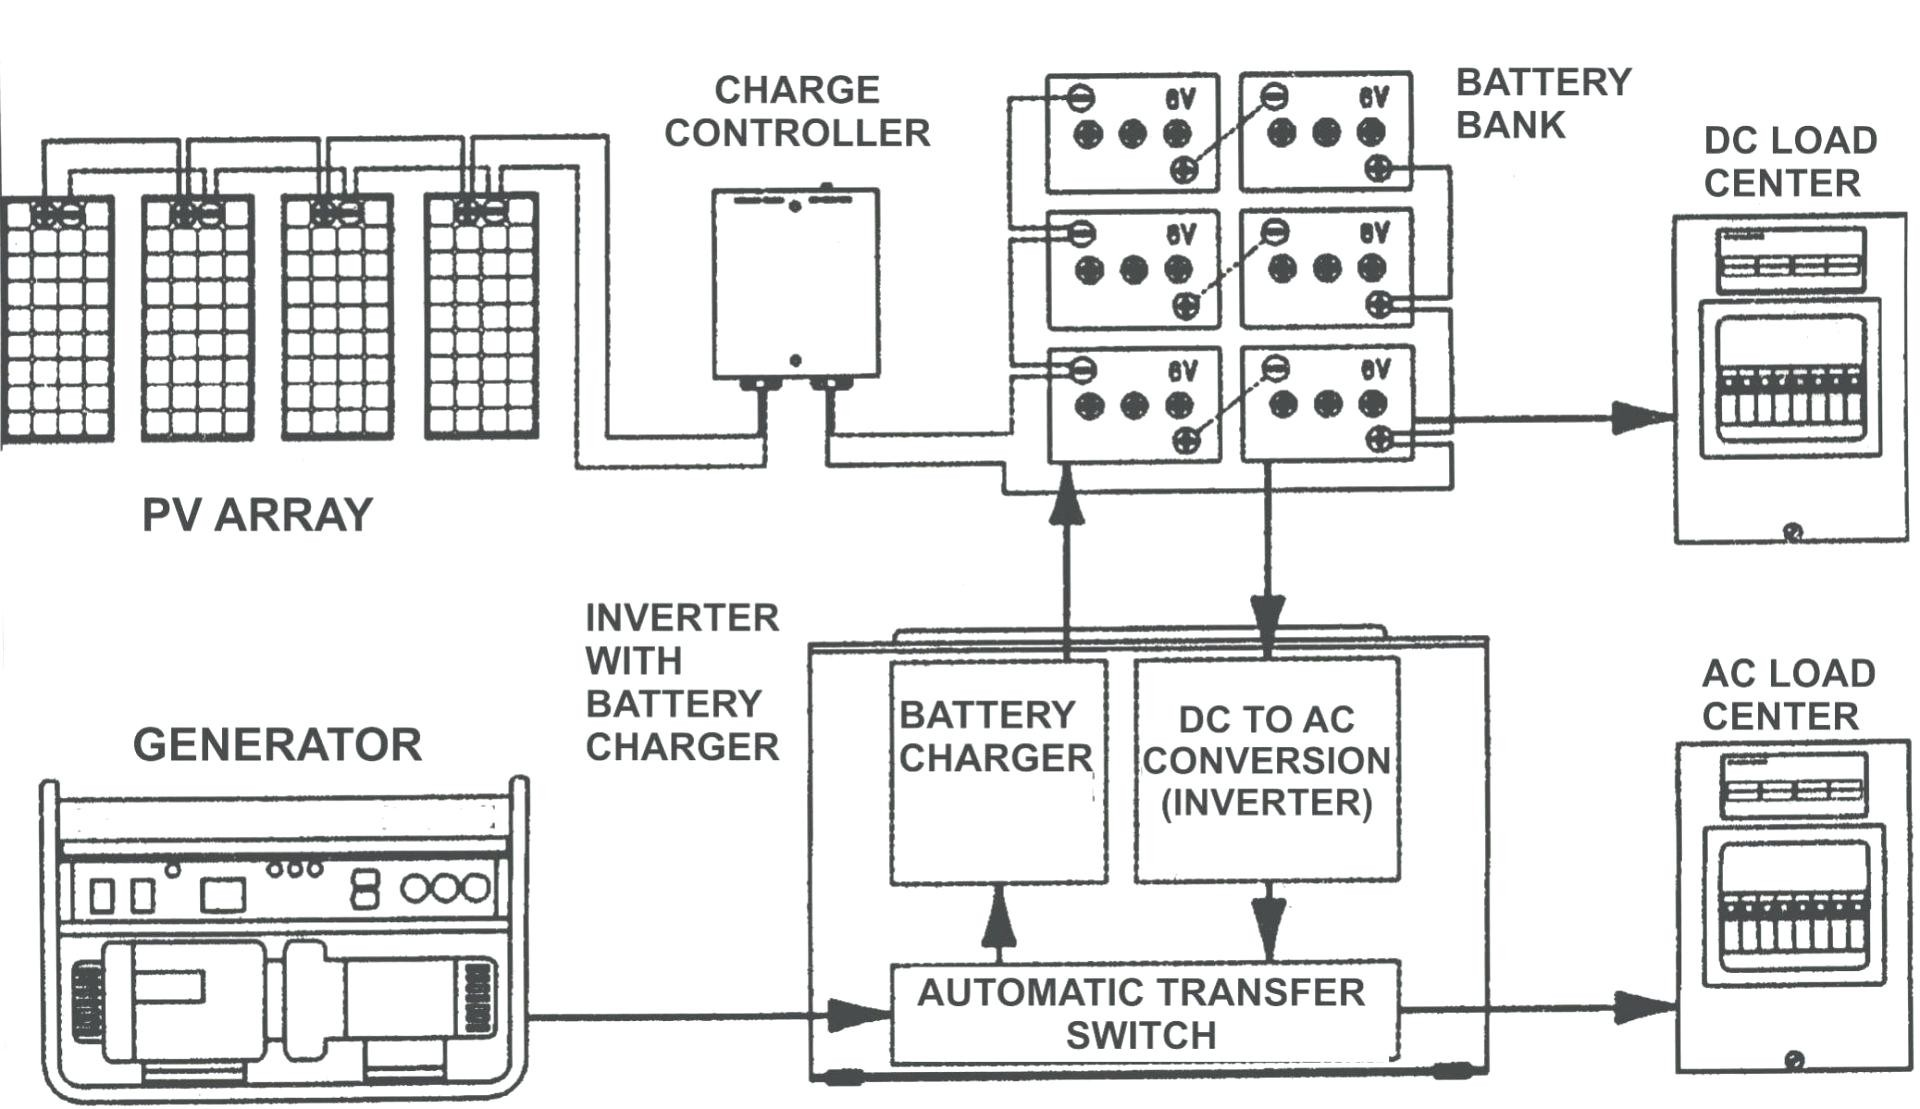 Boat Battery Wiring Diagram Marine Battery Charger Wiring Diagram Hbphelp Of Boat Battery Wiring Diagram